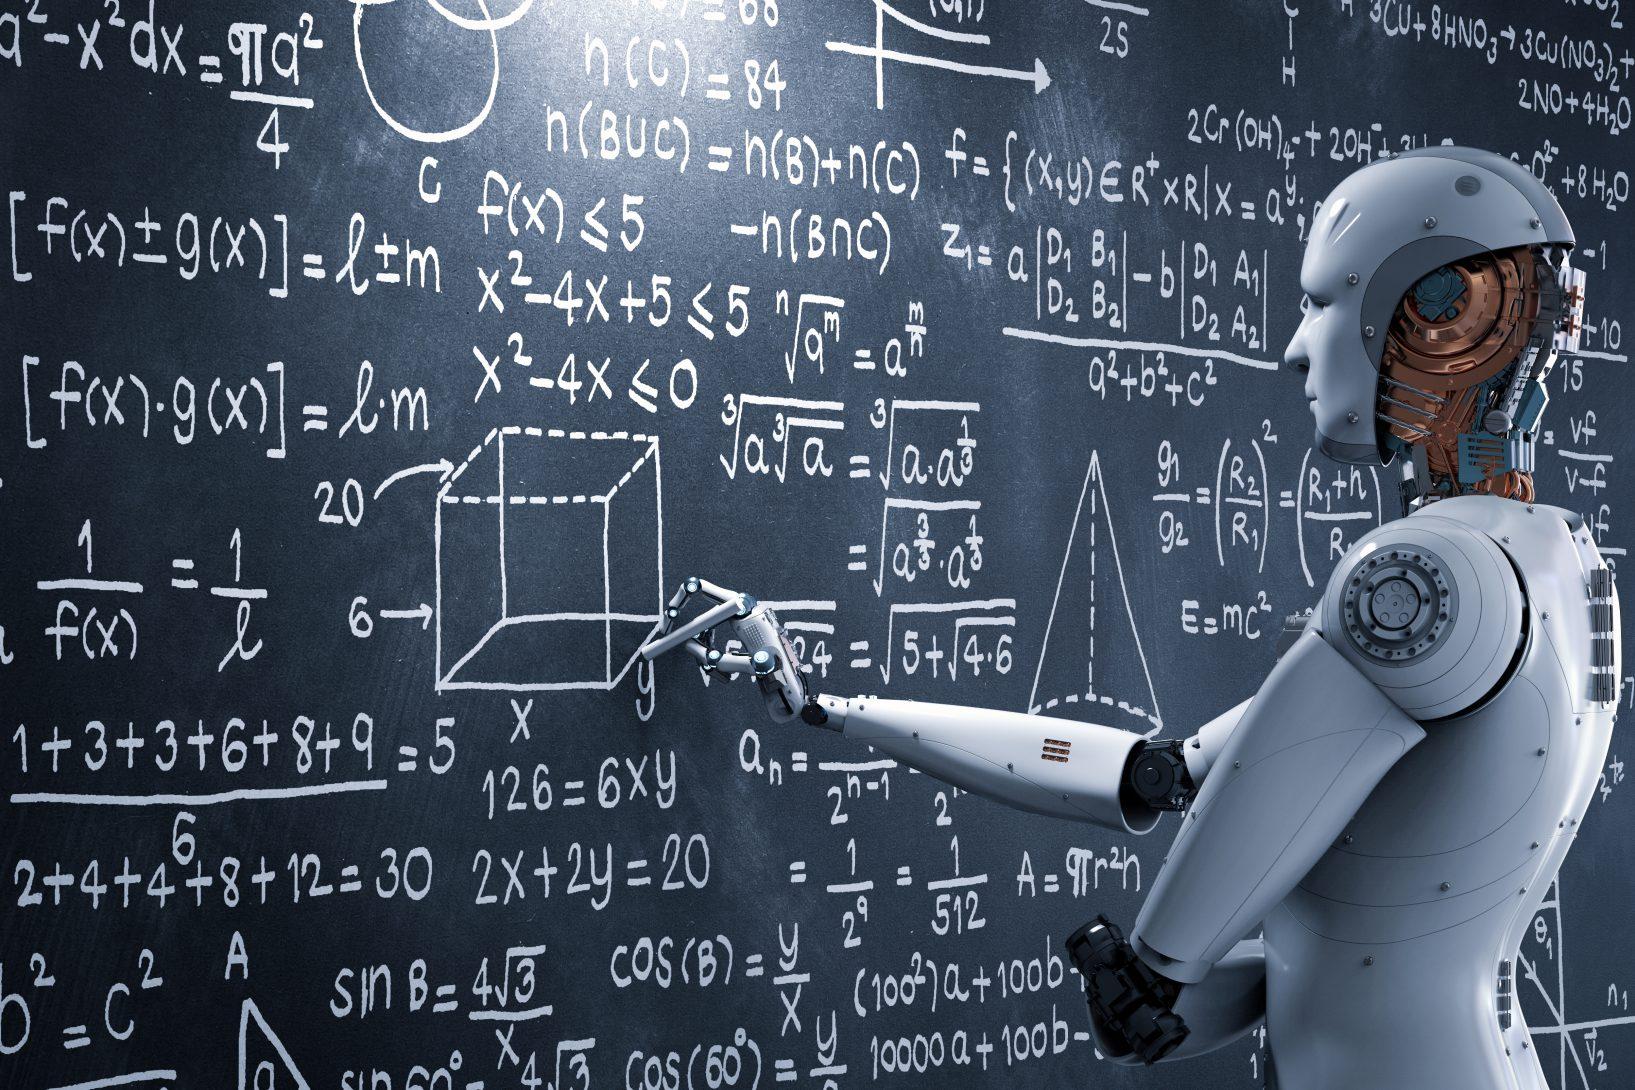 Kursus/Jasa/Bimbingan Skripsi/TA/Tesis/Disertasi Mahasiswa S1/S2/S3 Matlab  Deep Learning & Neural Networks Menggunakan Matlab